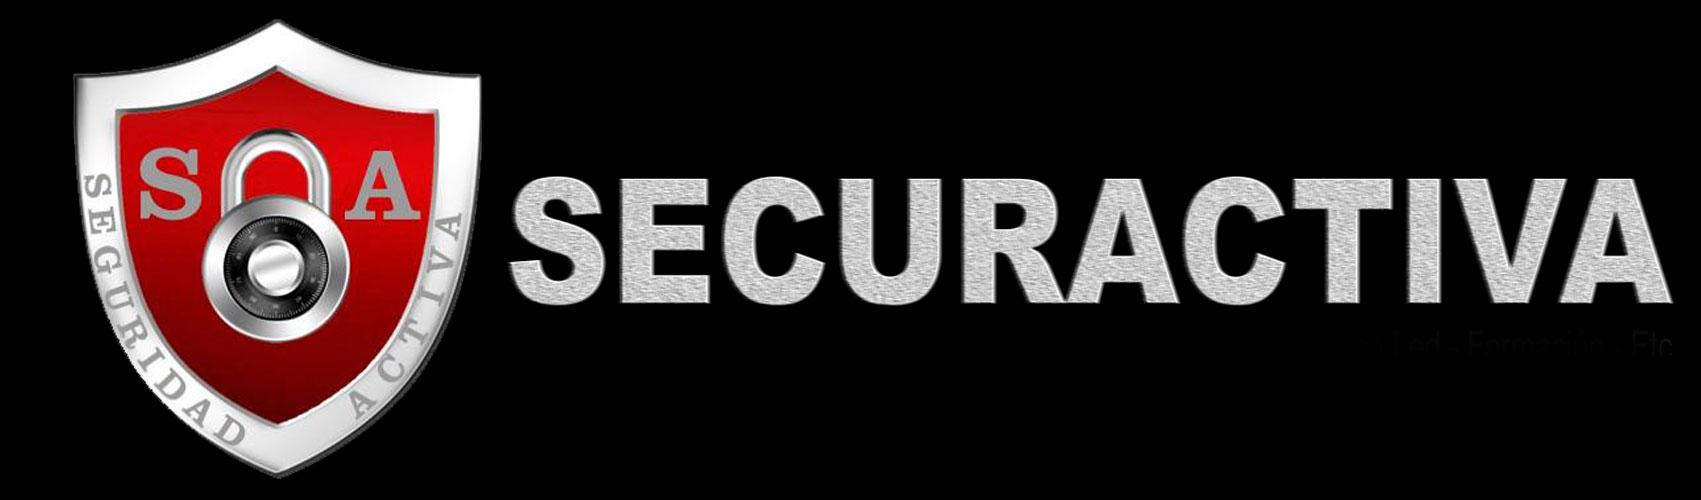 Securactiva